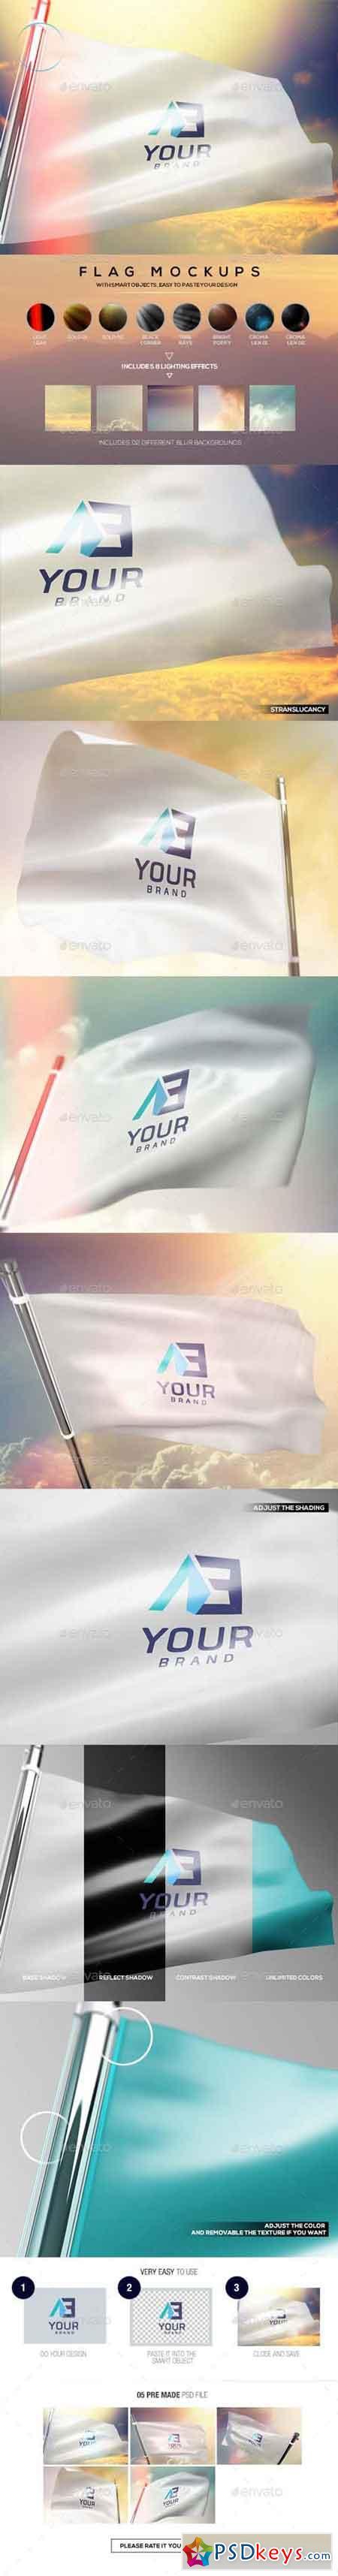 Flag Mockups 13606679